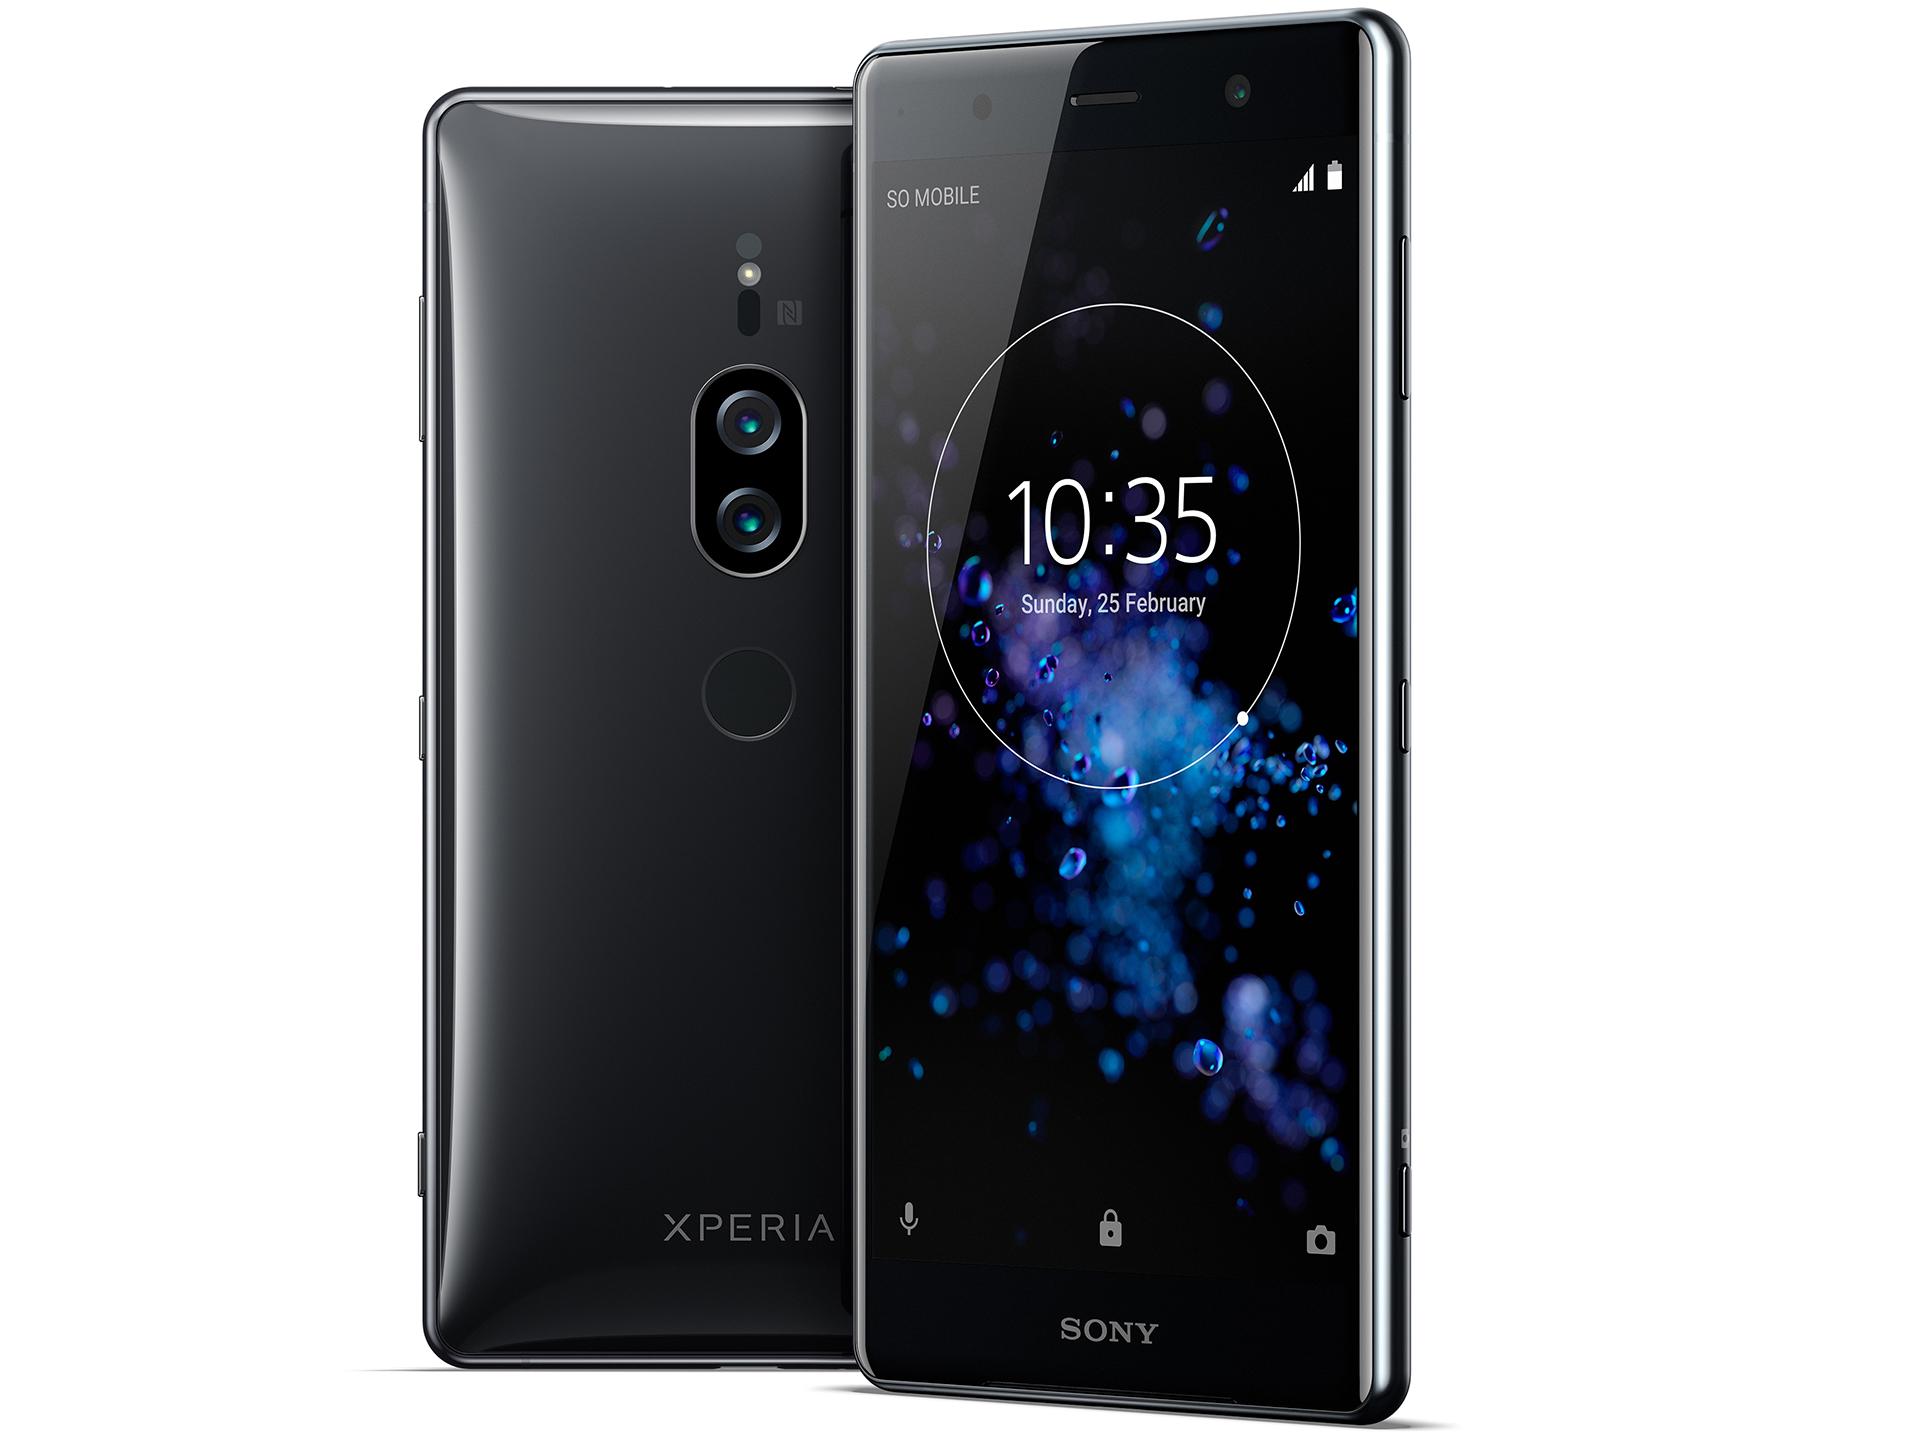 Sony Xperia Xz2 Premium Smartphone Review Reviews Original File 1239 X 1754 Pixels Size 211 Mb Mime